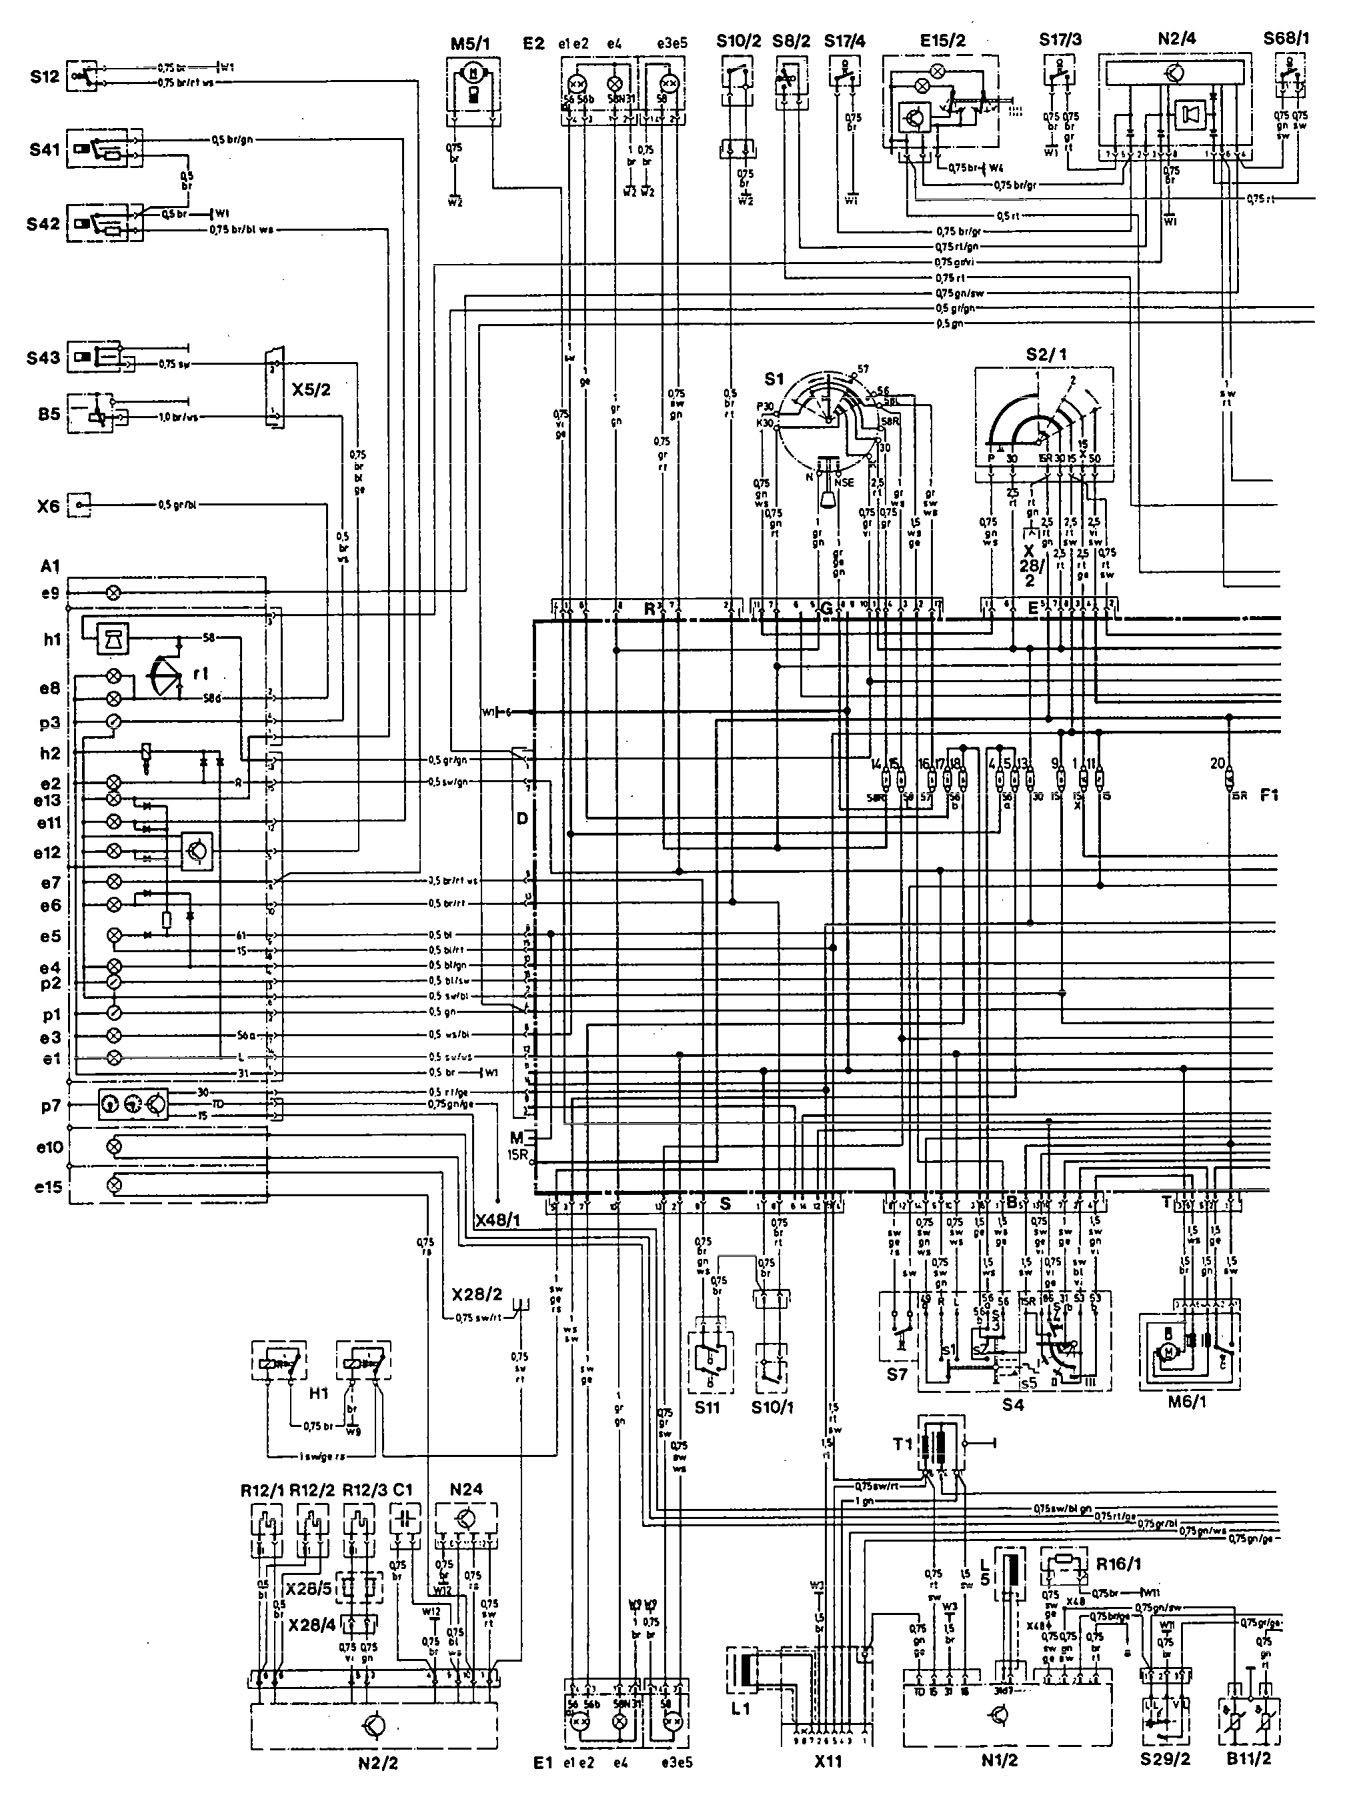 Mercede Sprinter Fuse Box Diagram